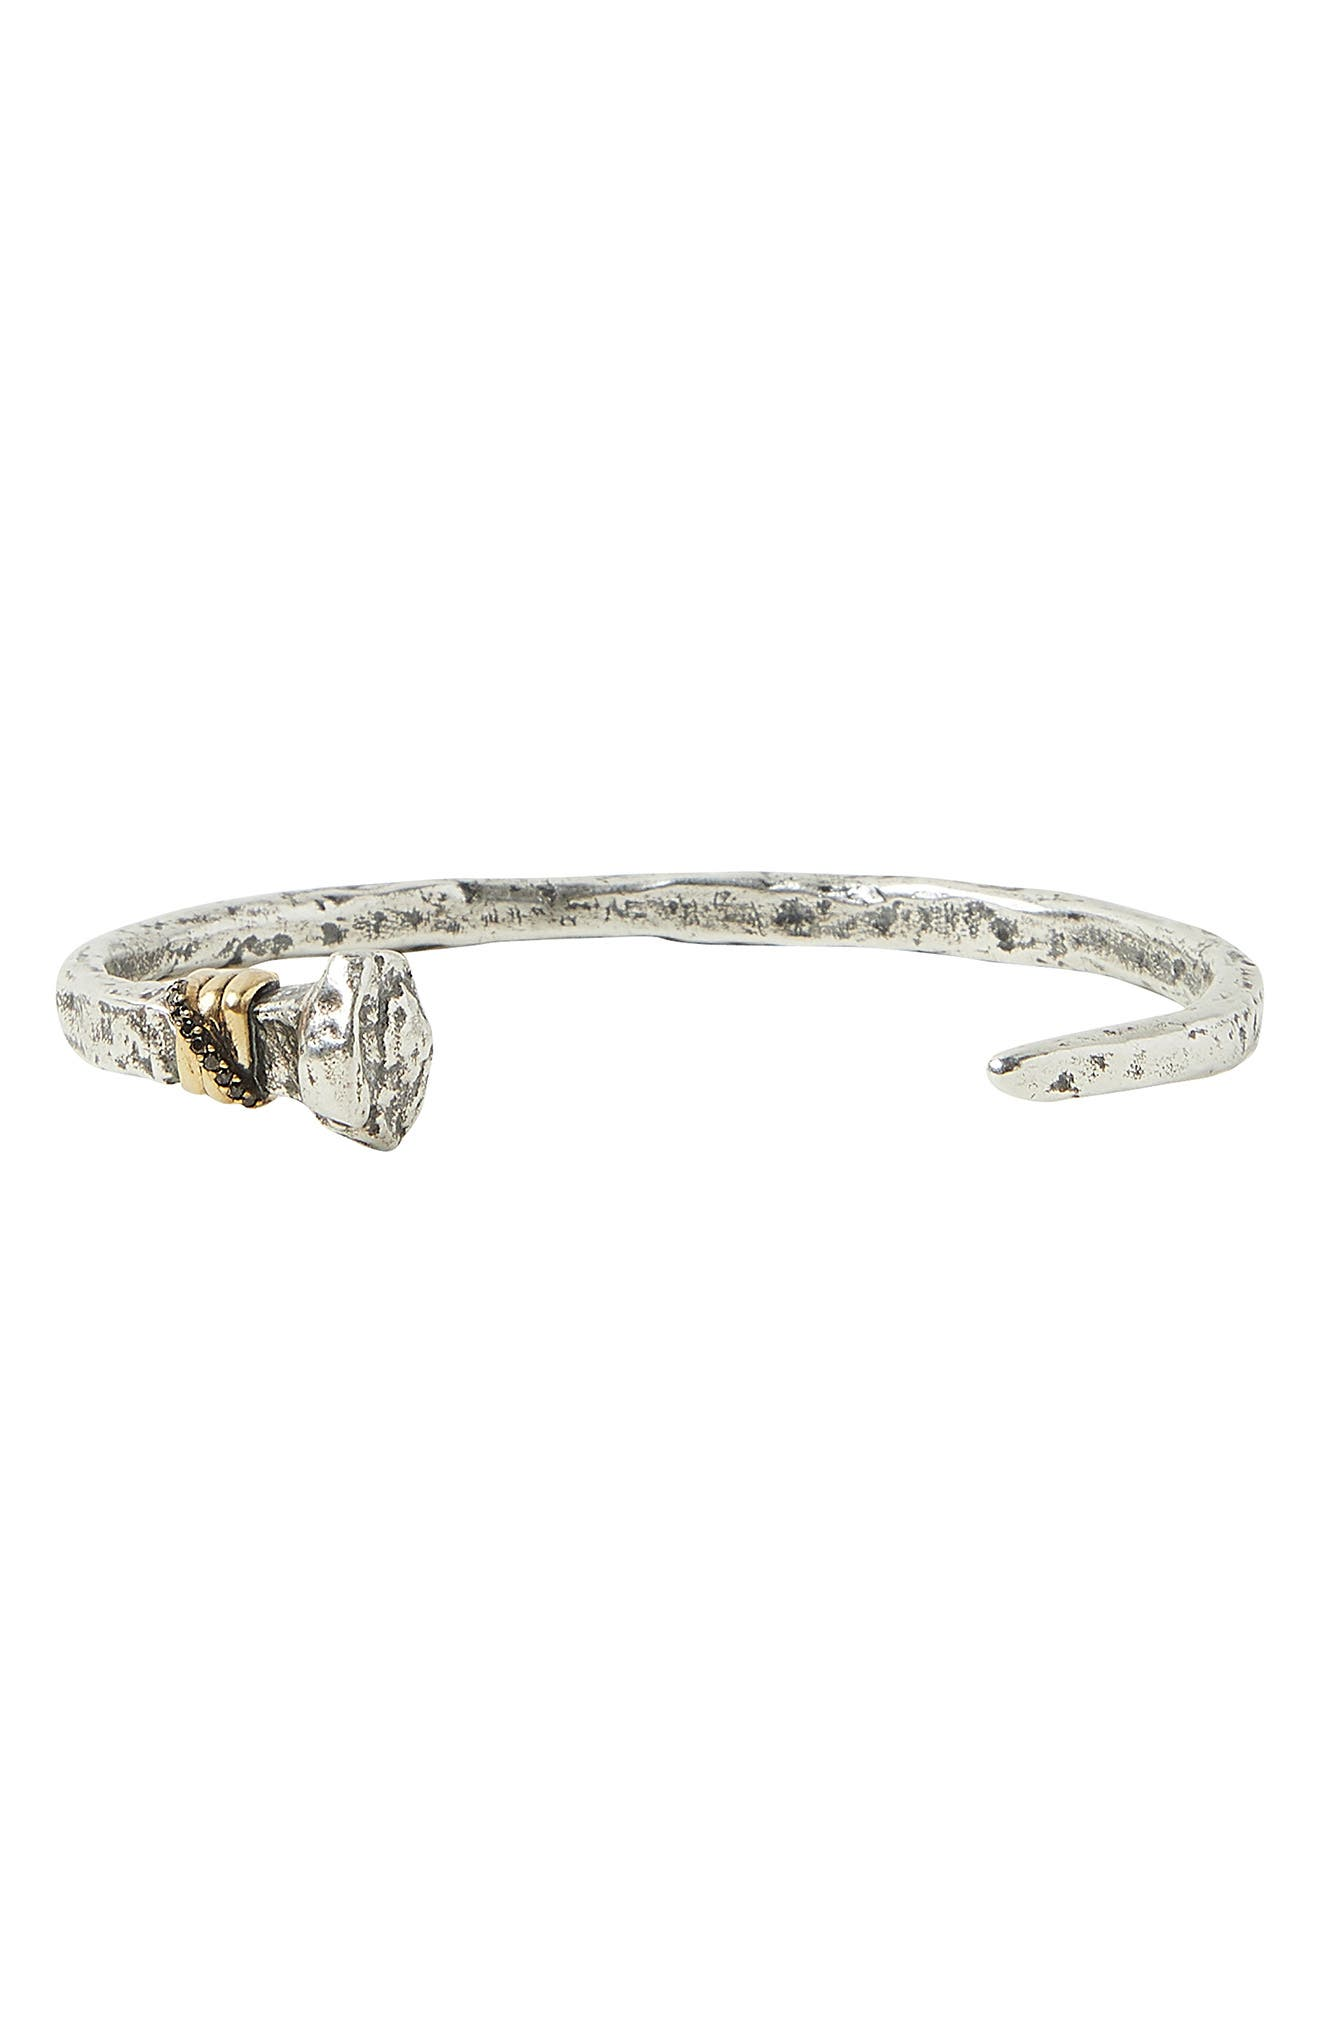 Women's John Varvatos Nails Sterling Silver & Black Diamond Cuff Bracelet